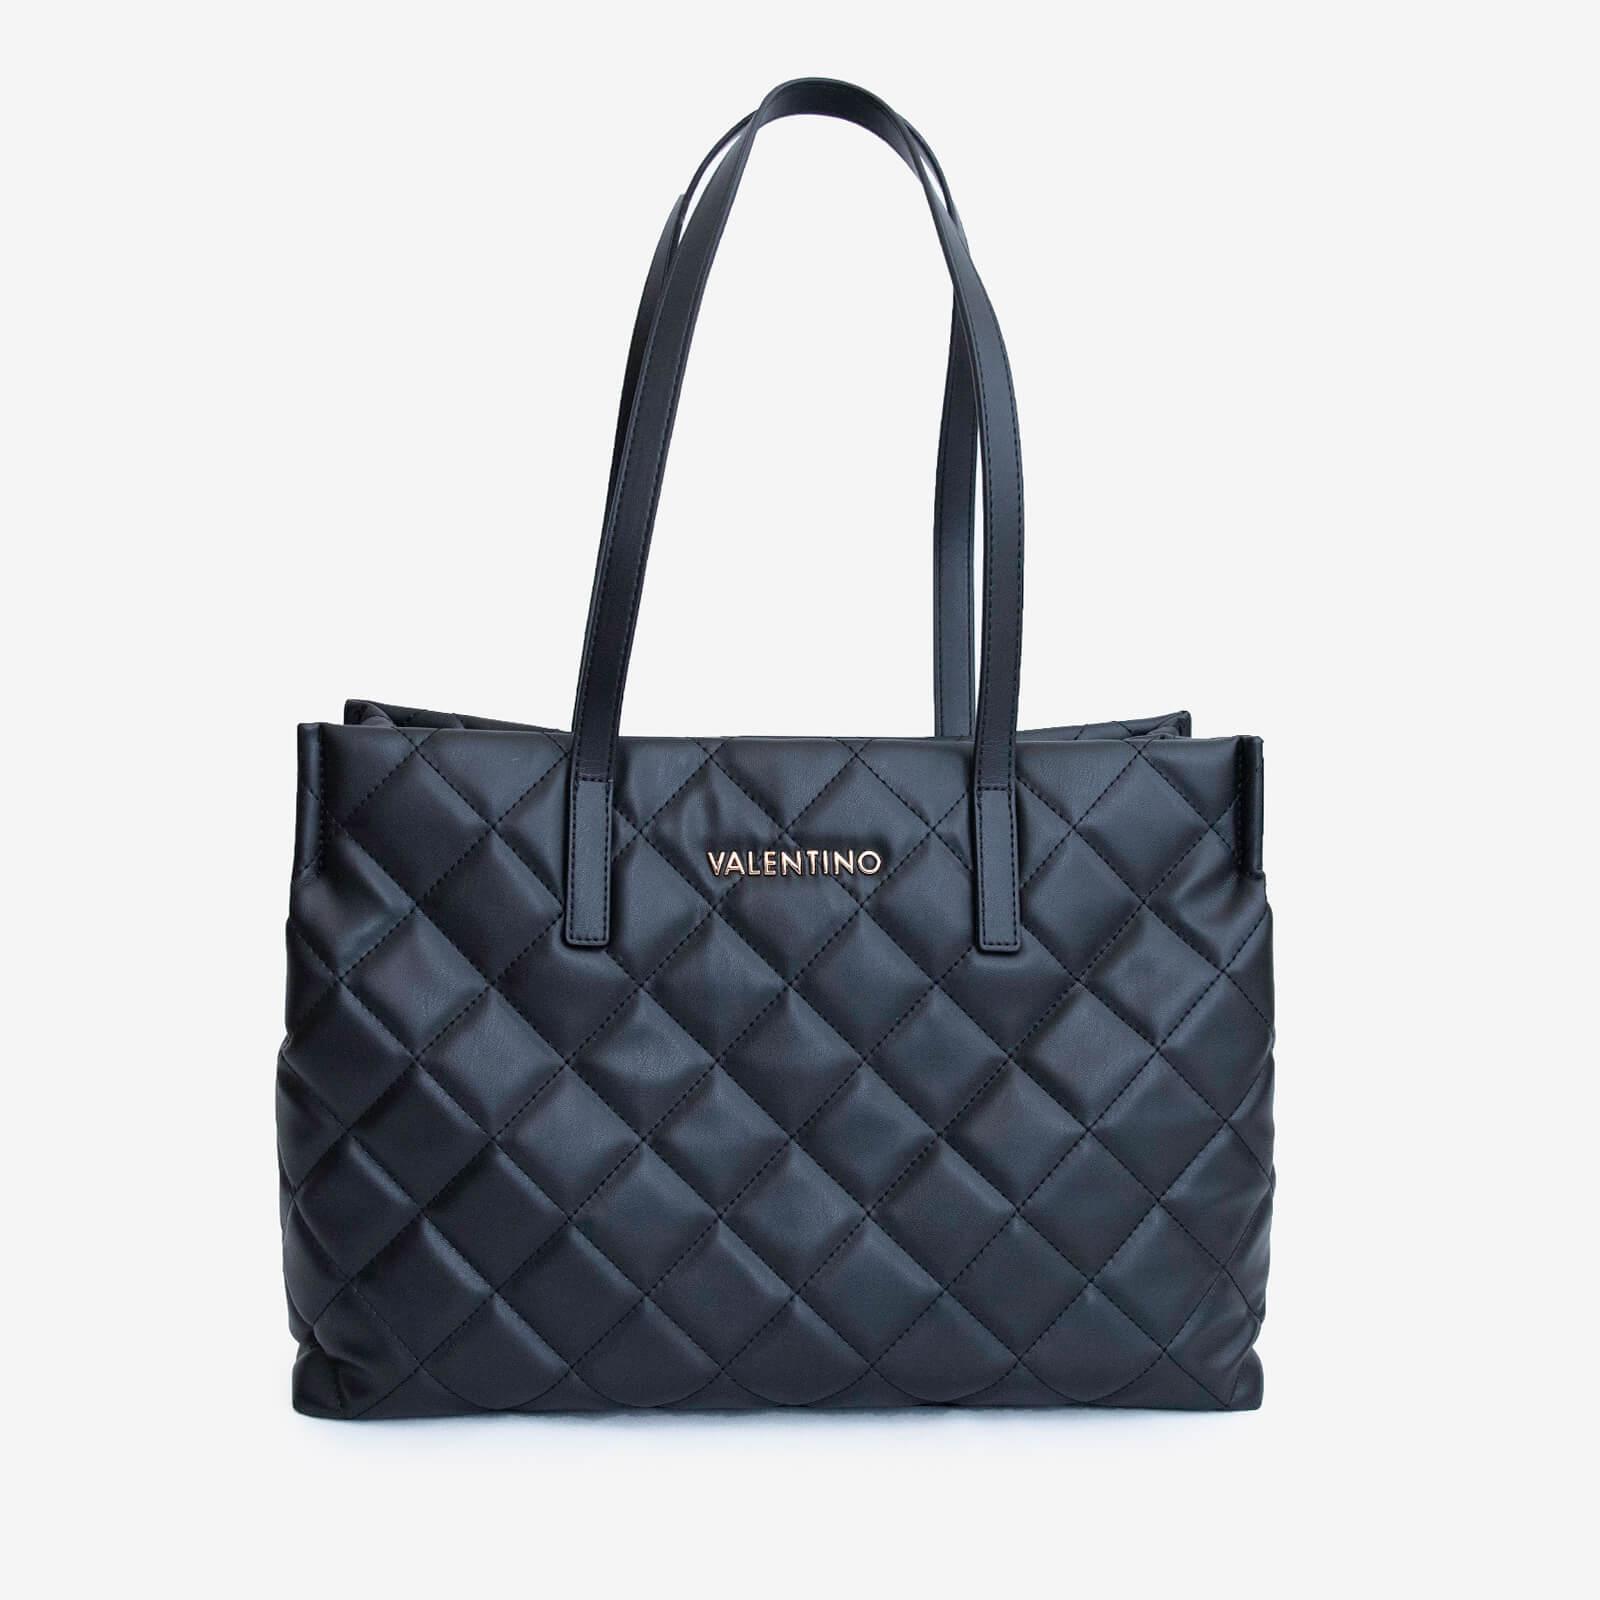 Valentino Bags Women's Ocarina Tote Bag - Black